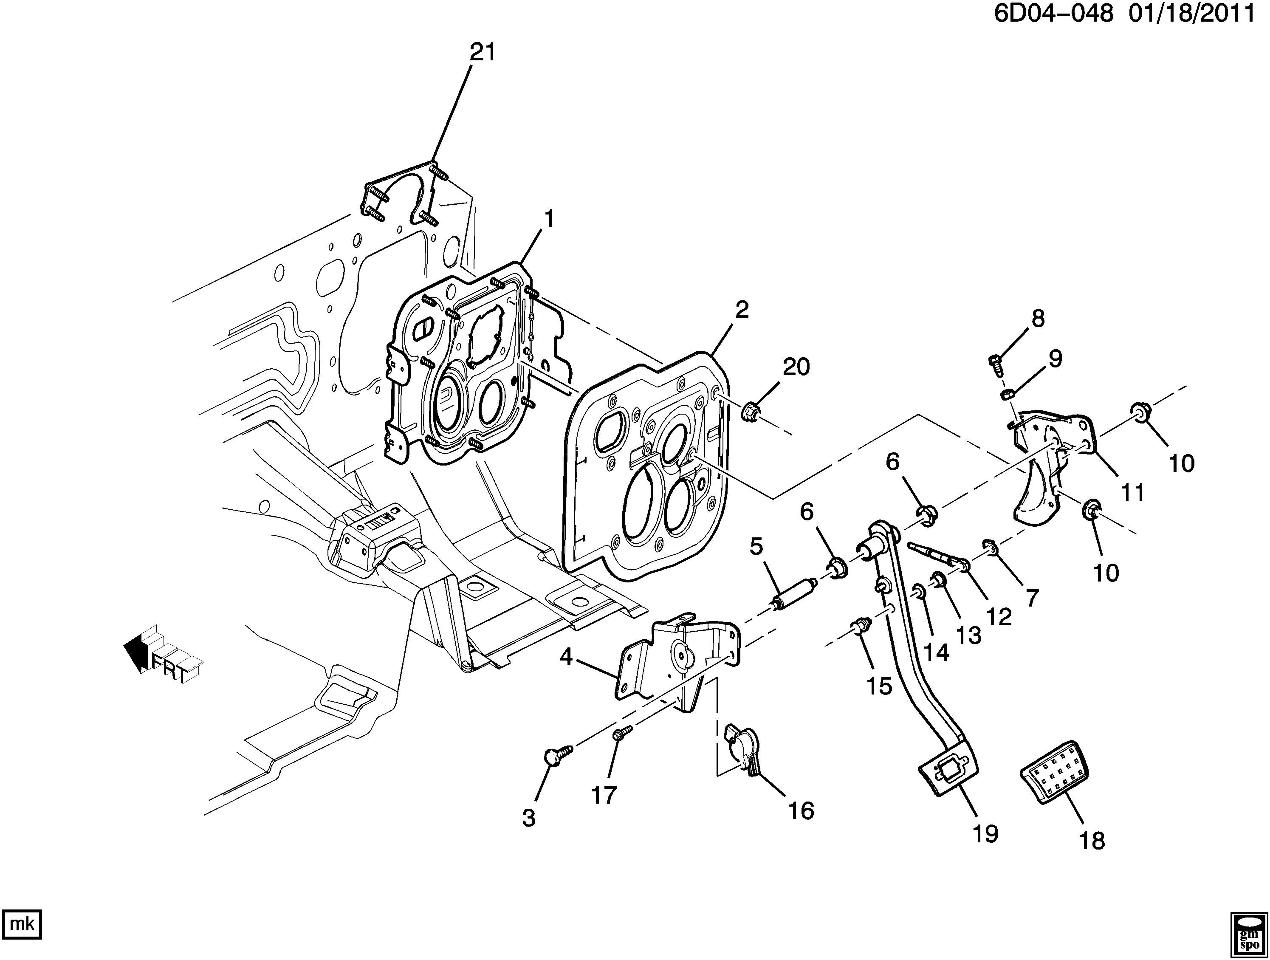 2006-2010 Solstice SKY Brake Pedal Position Sensor New OEM